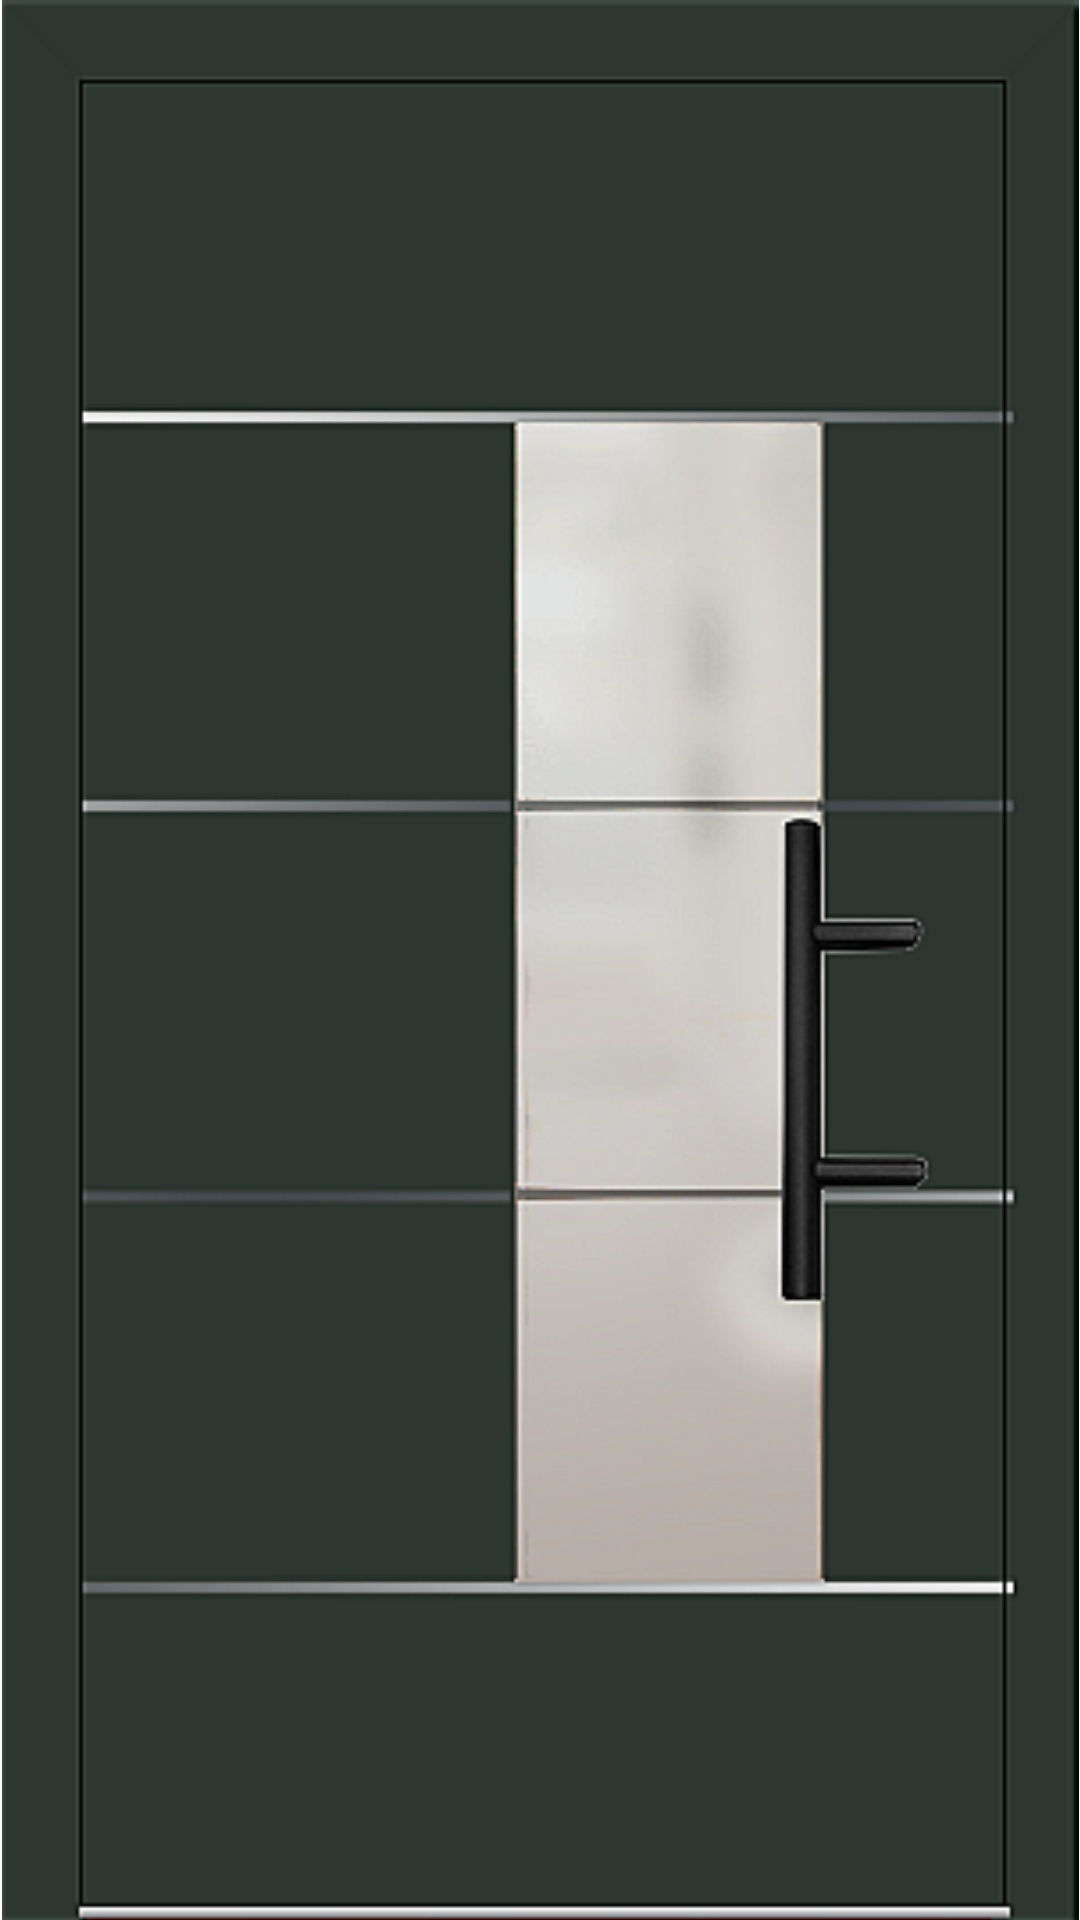 Holz-Alu Haustür Modell 66878 tannengrün